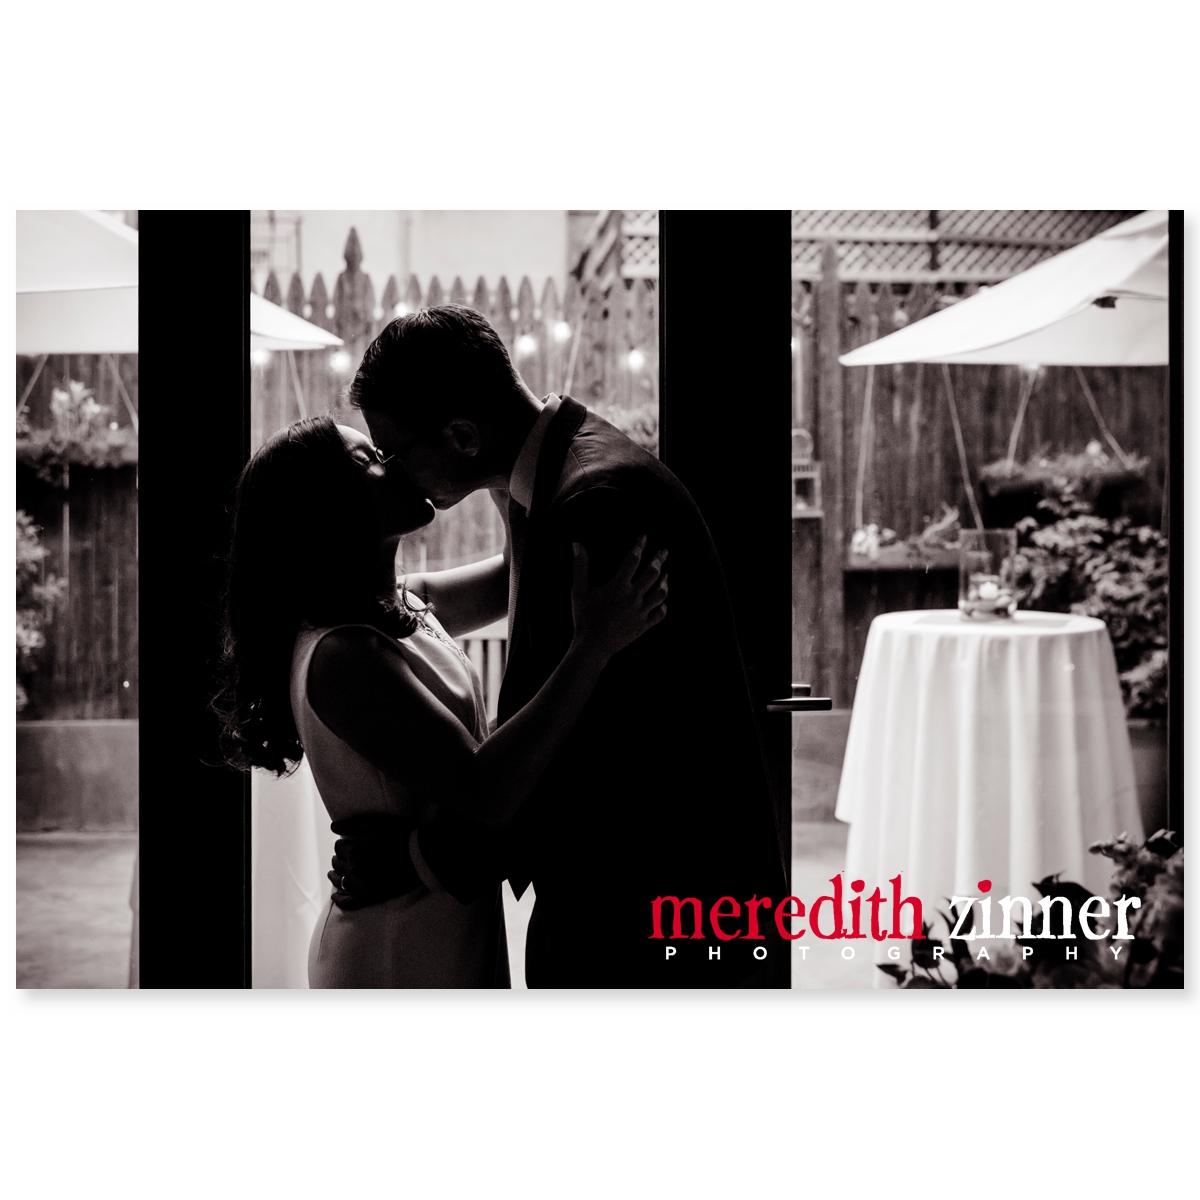 Meredith_Zinner_Photography_StilesCelebration_0007